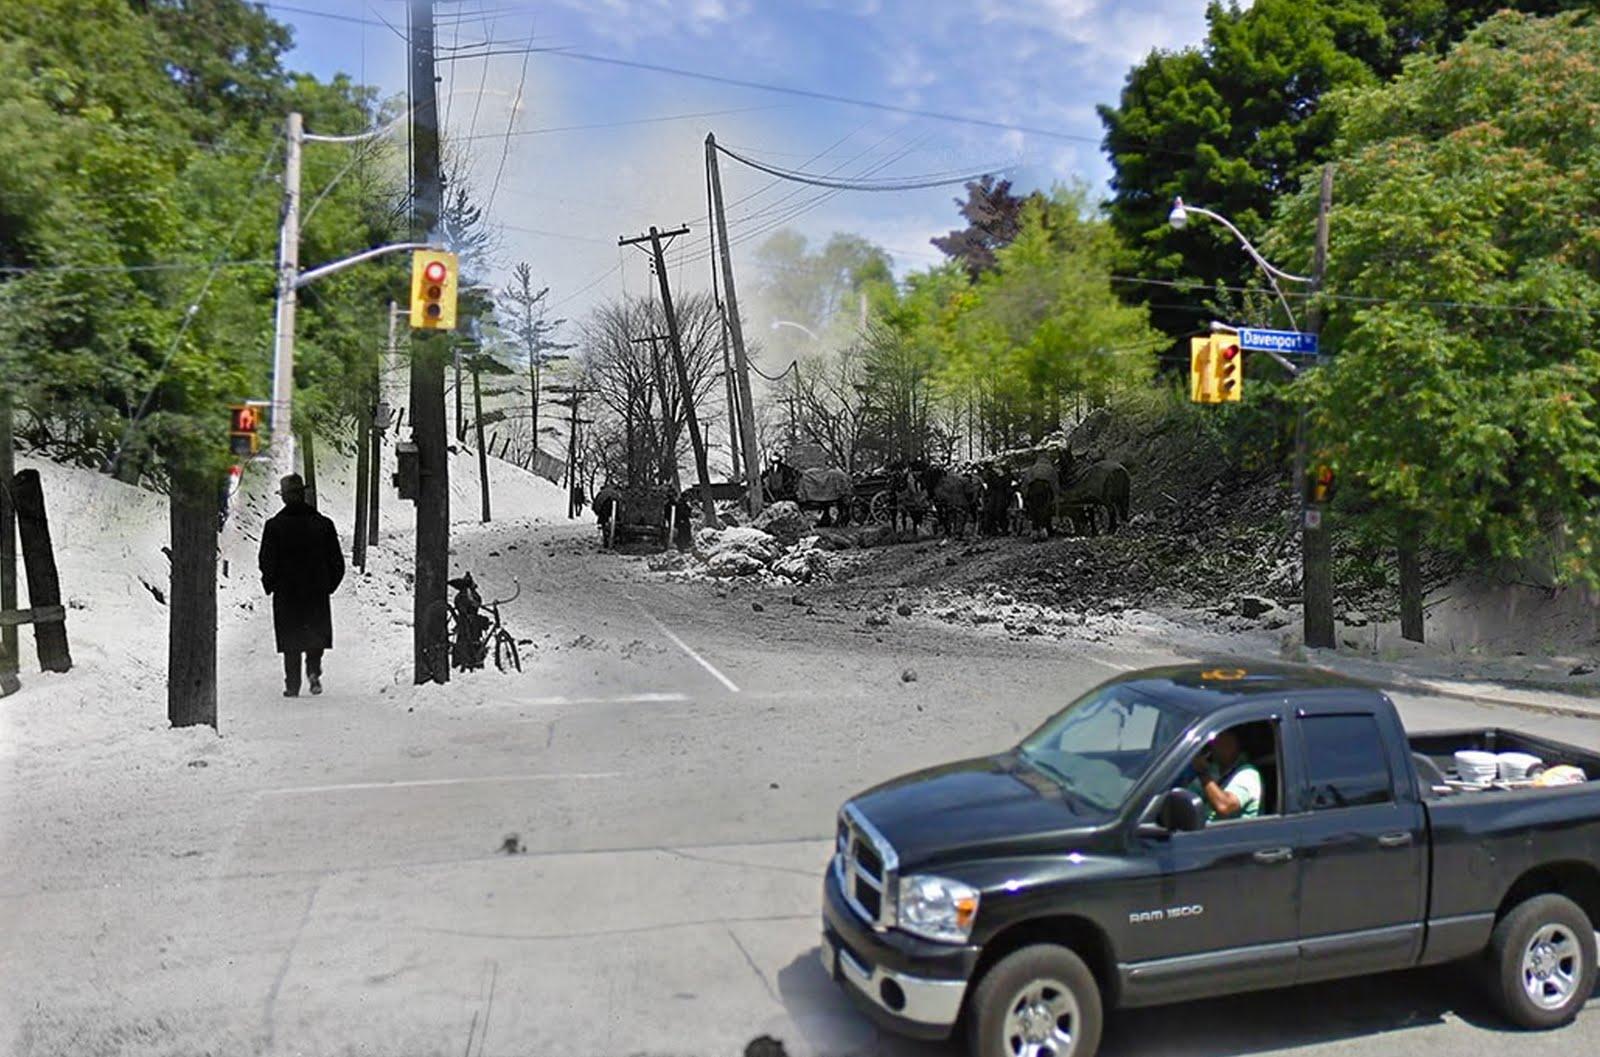 Toronto Mature Escort Davenport Dupont